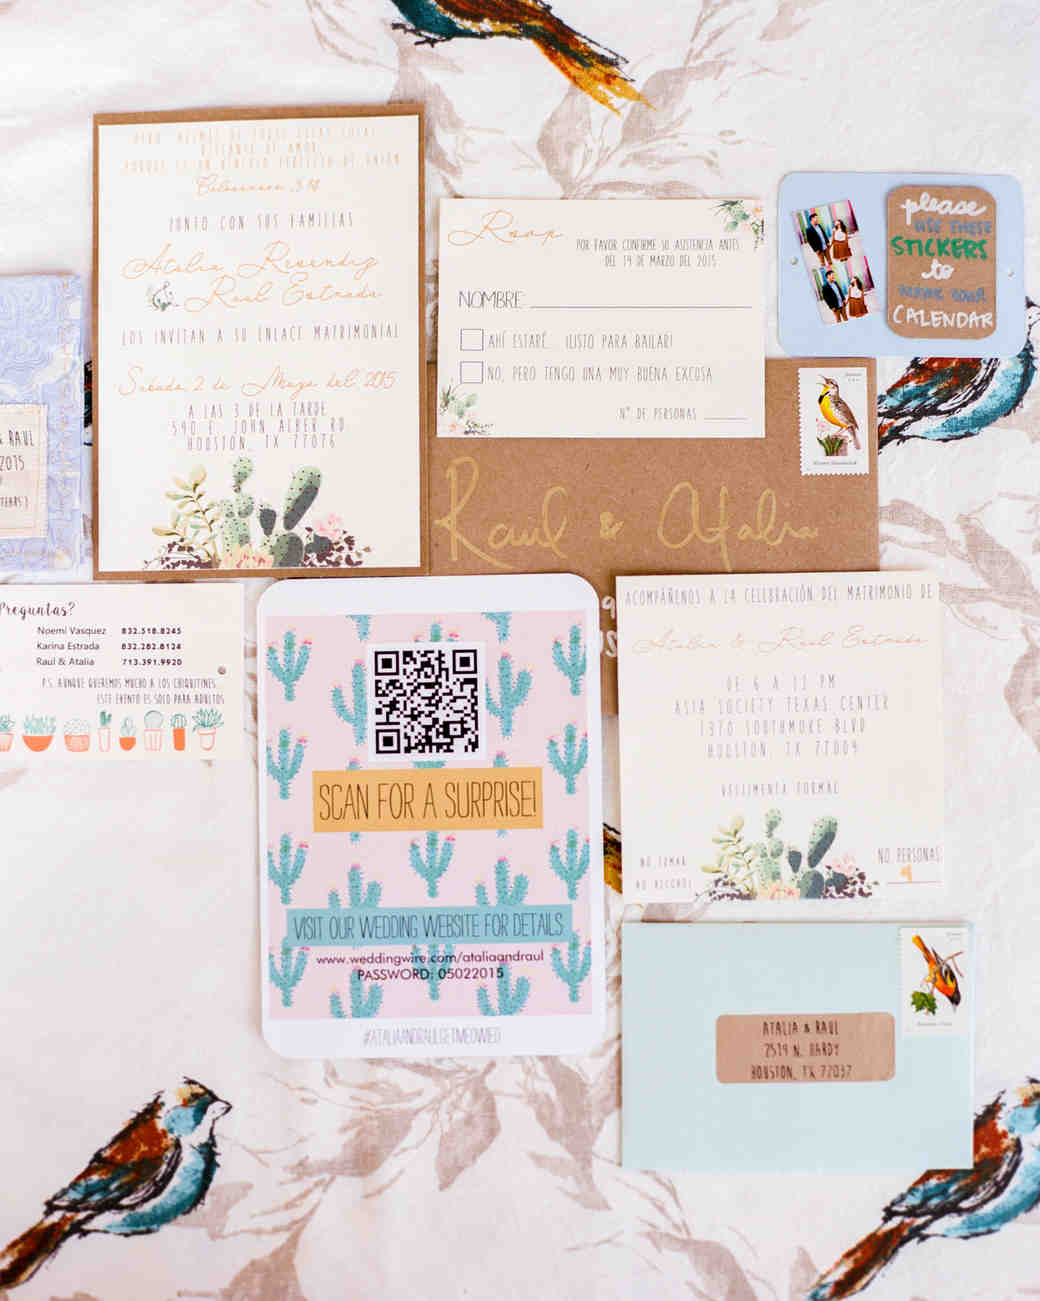 Colorful Wedding Invitation Suite with Cactus Motif